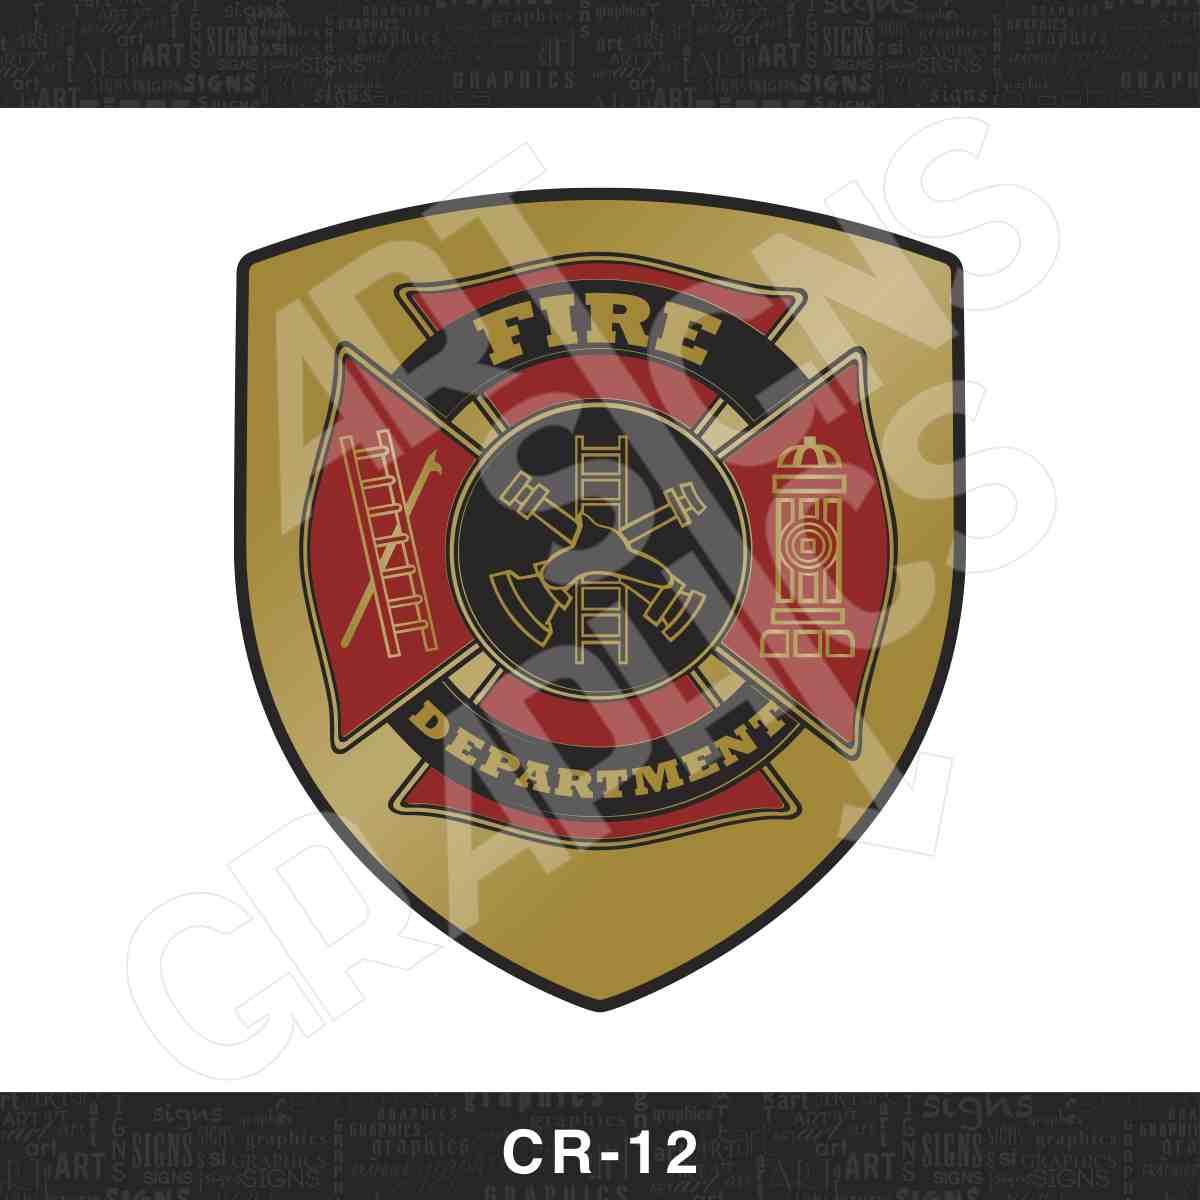 CR-12.jpg